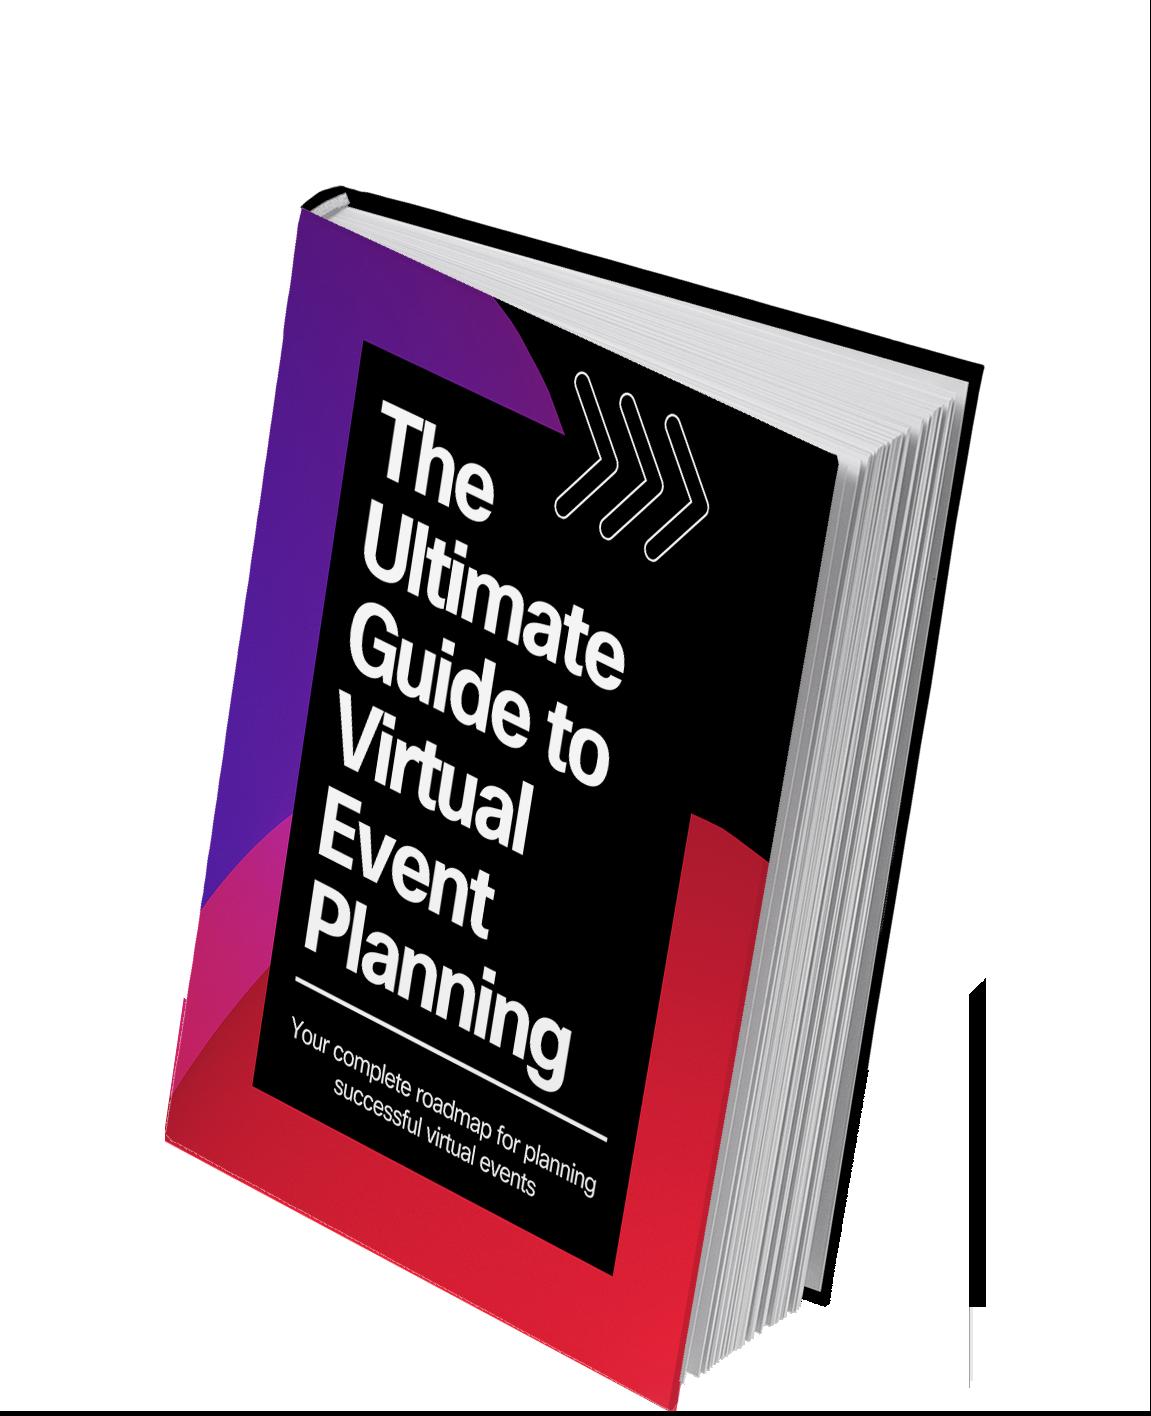 virtual-event-planning-book-mockup-circled (1)